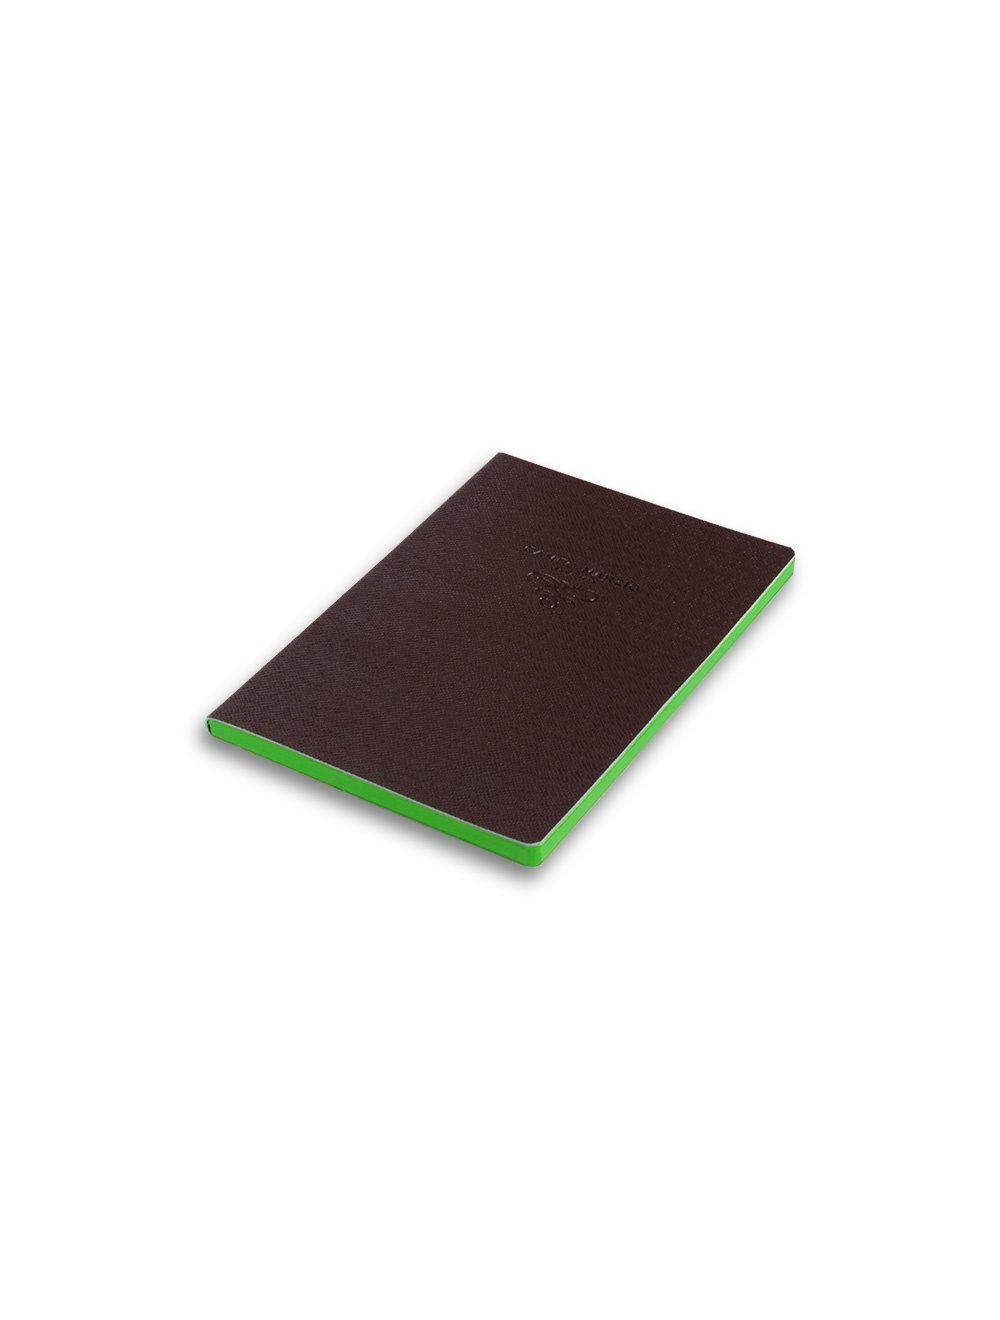 Journal 11 X 16 Saffiano - Brown